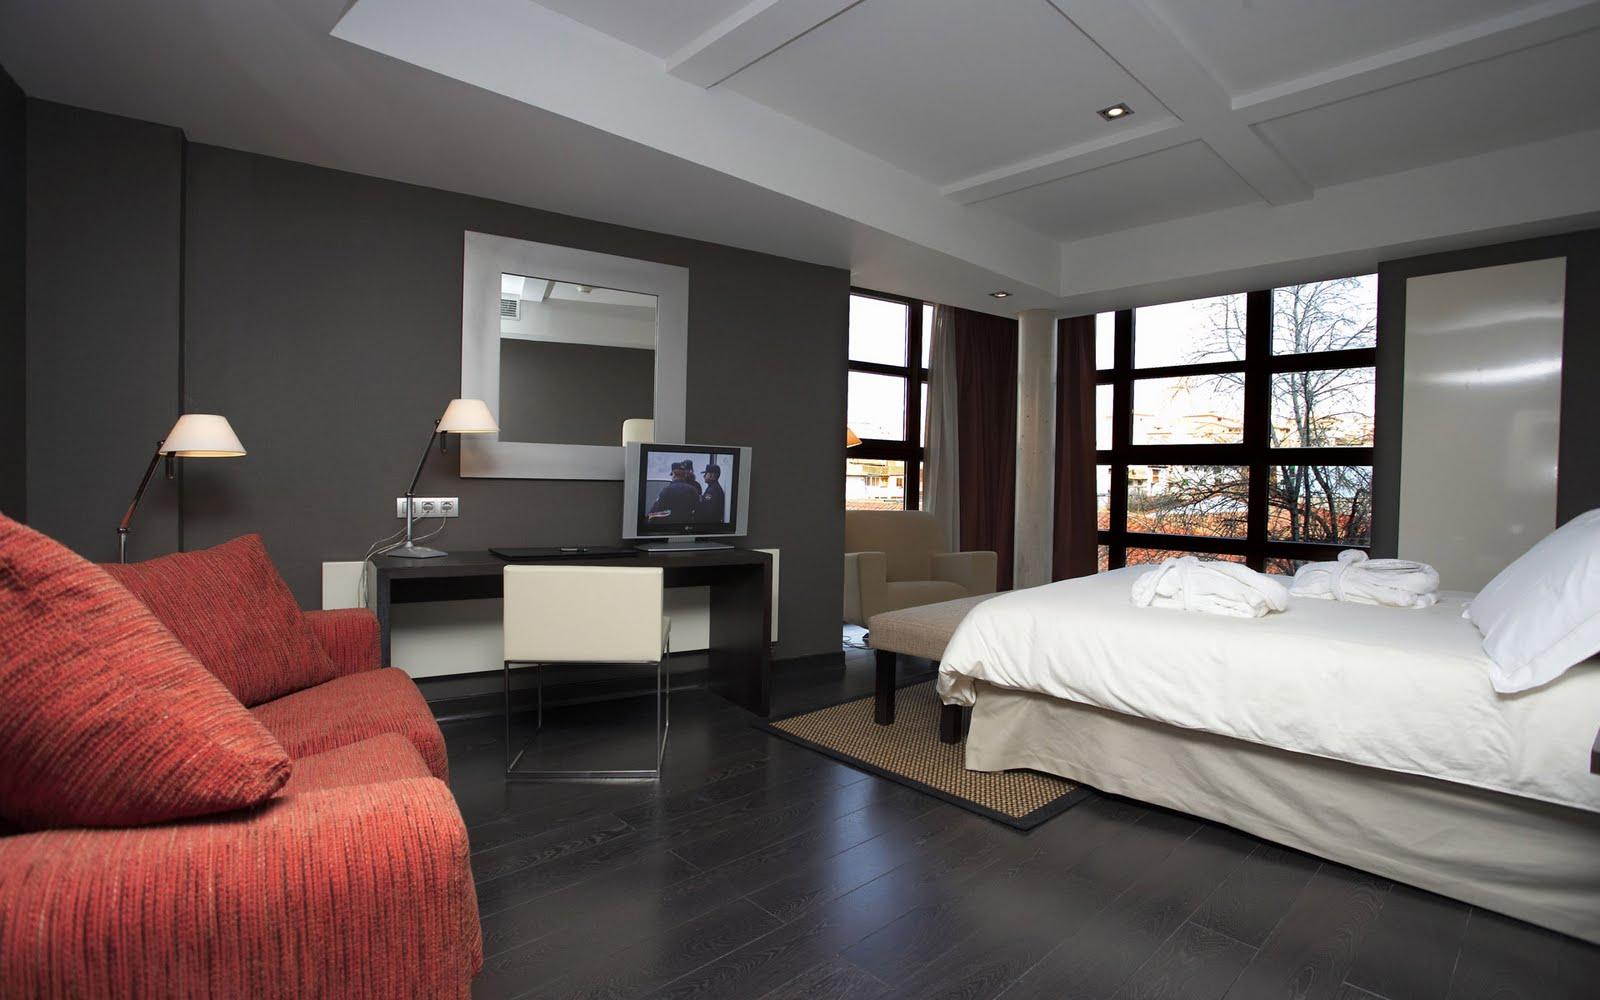 Home Interior Pictures: Home interior design picture 87